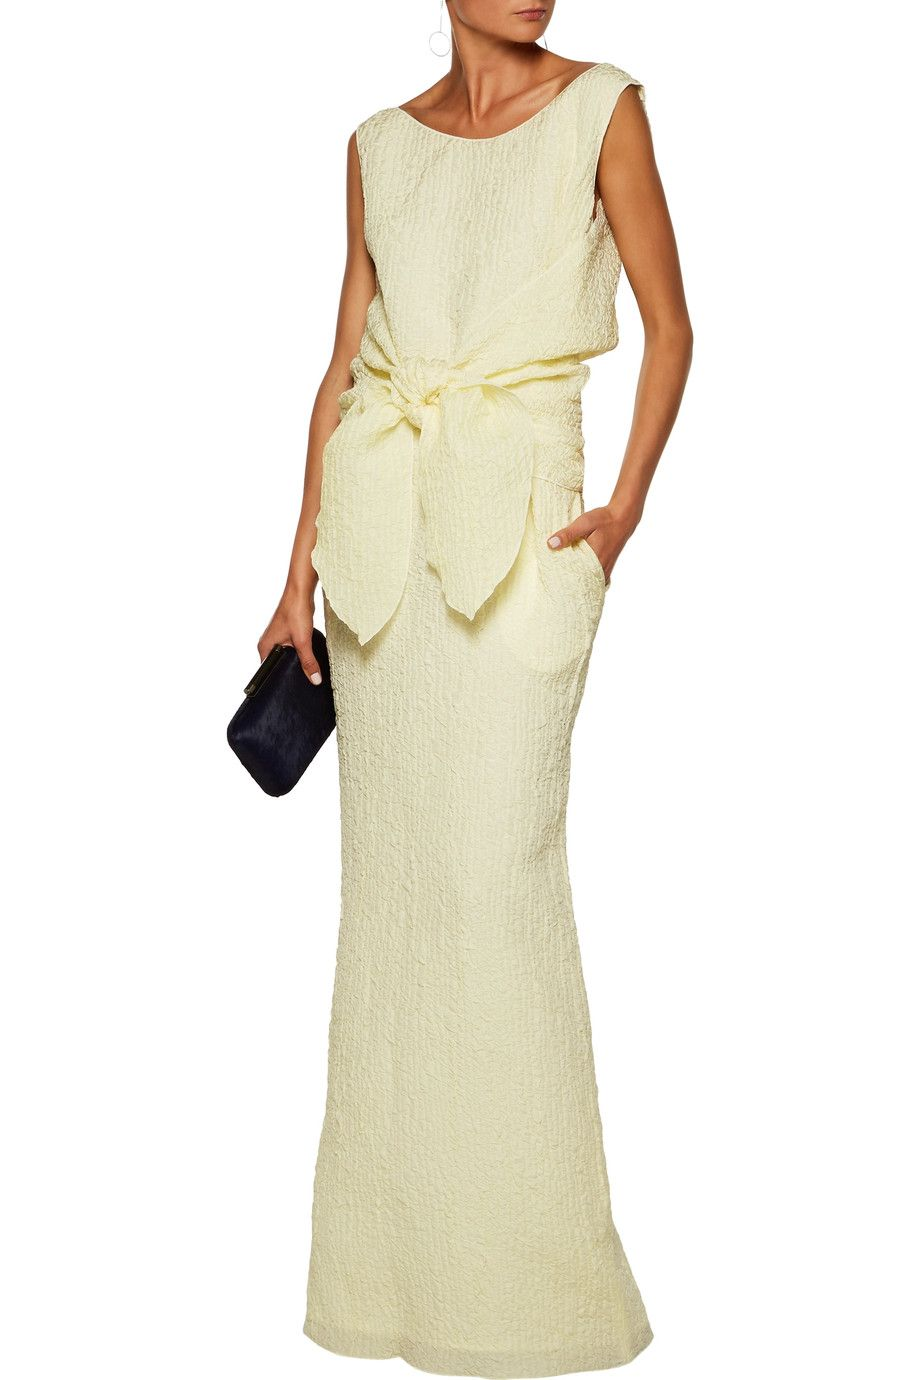 Nina Ricci tie-front silk-blend seersucker maxi dress | Playing ...